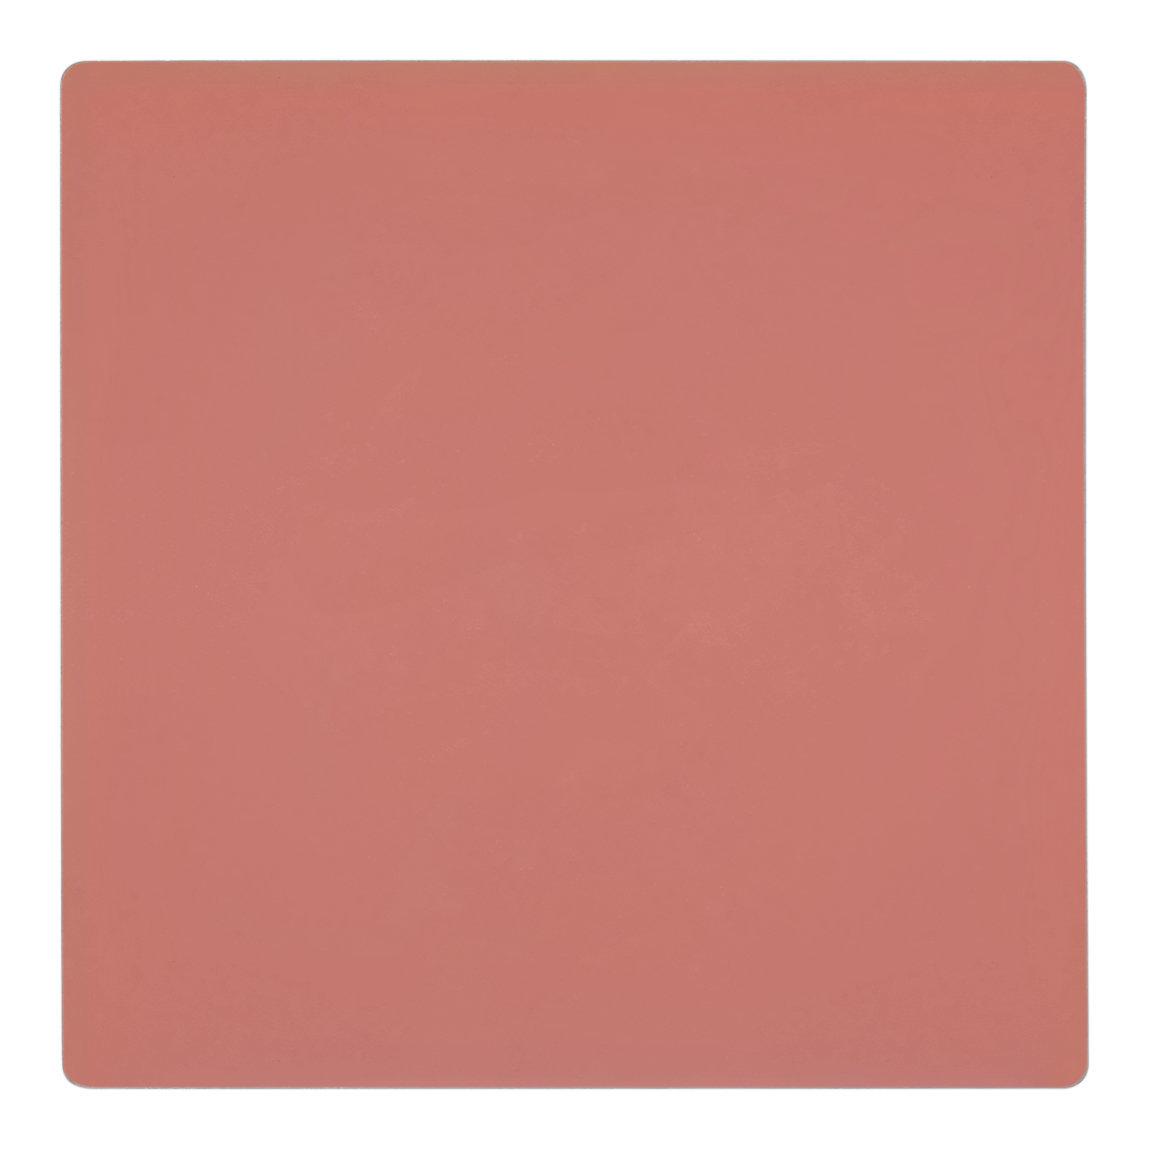 Kjaer Weis Cream Blush Refill Embrace